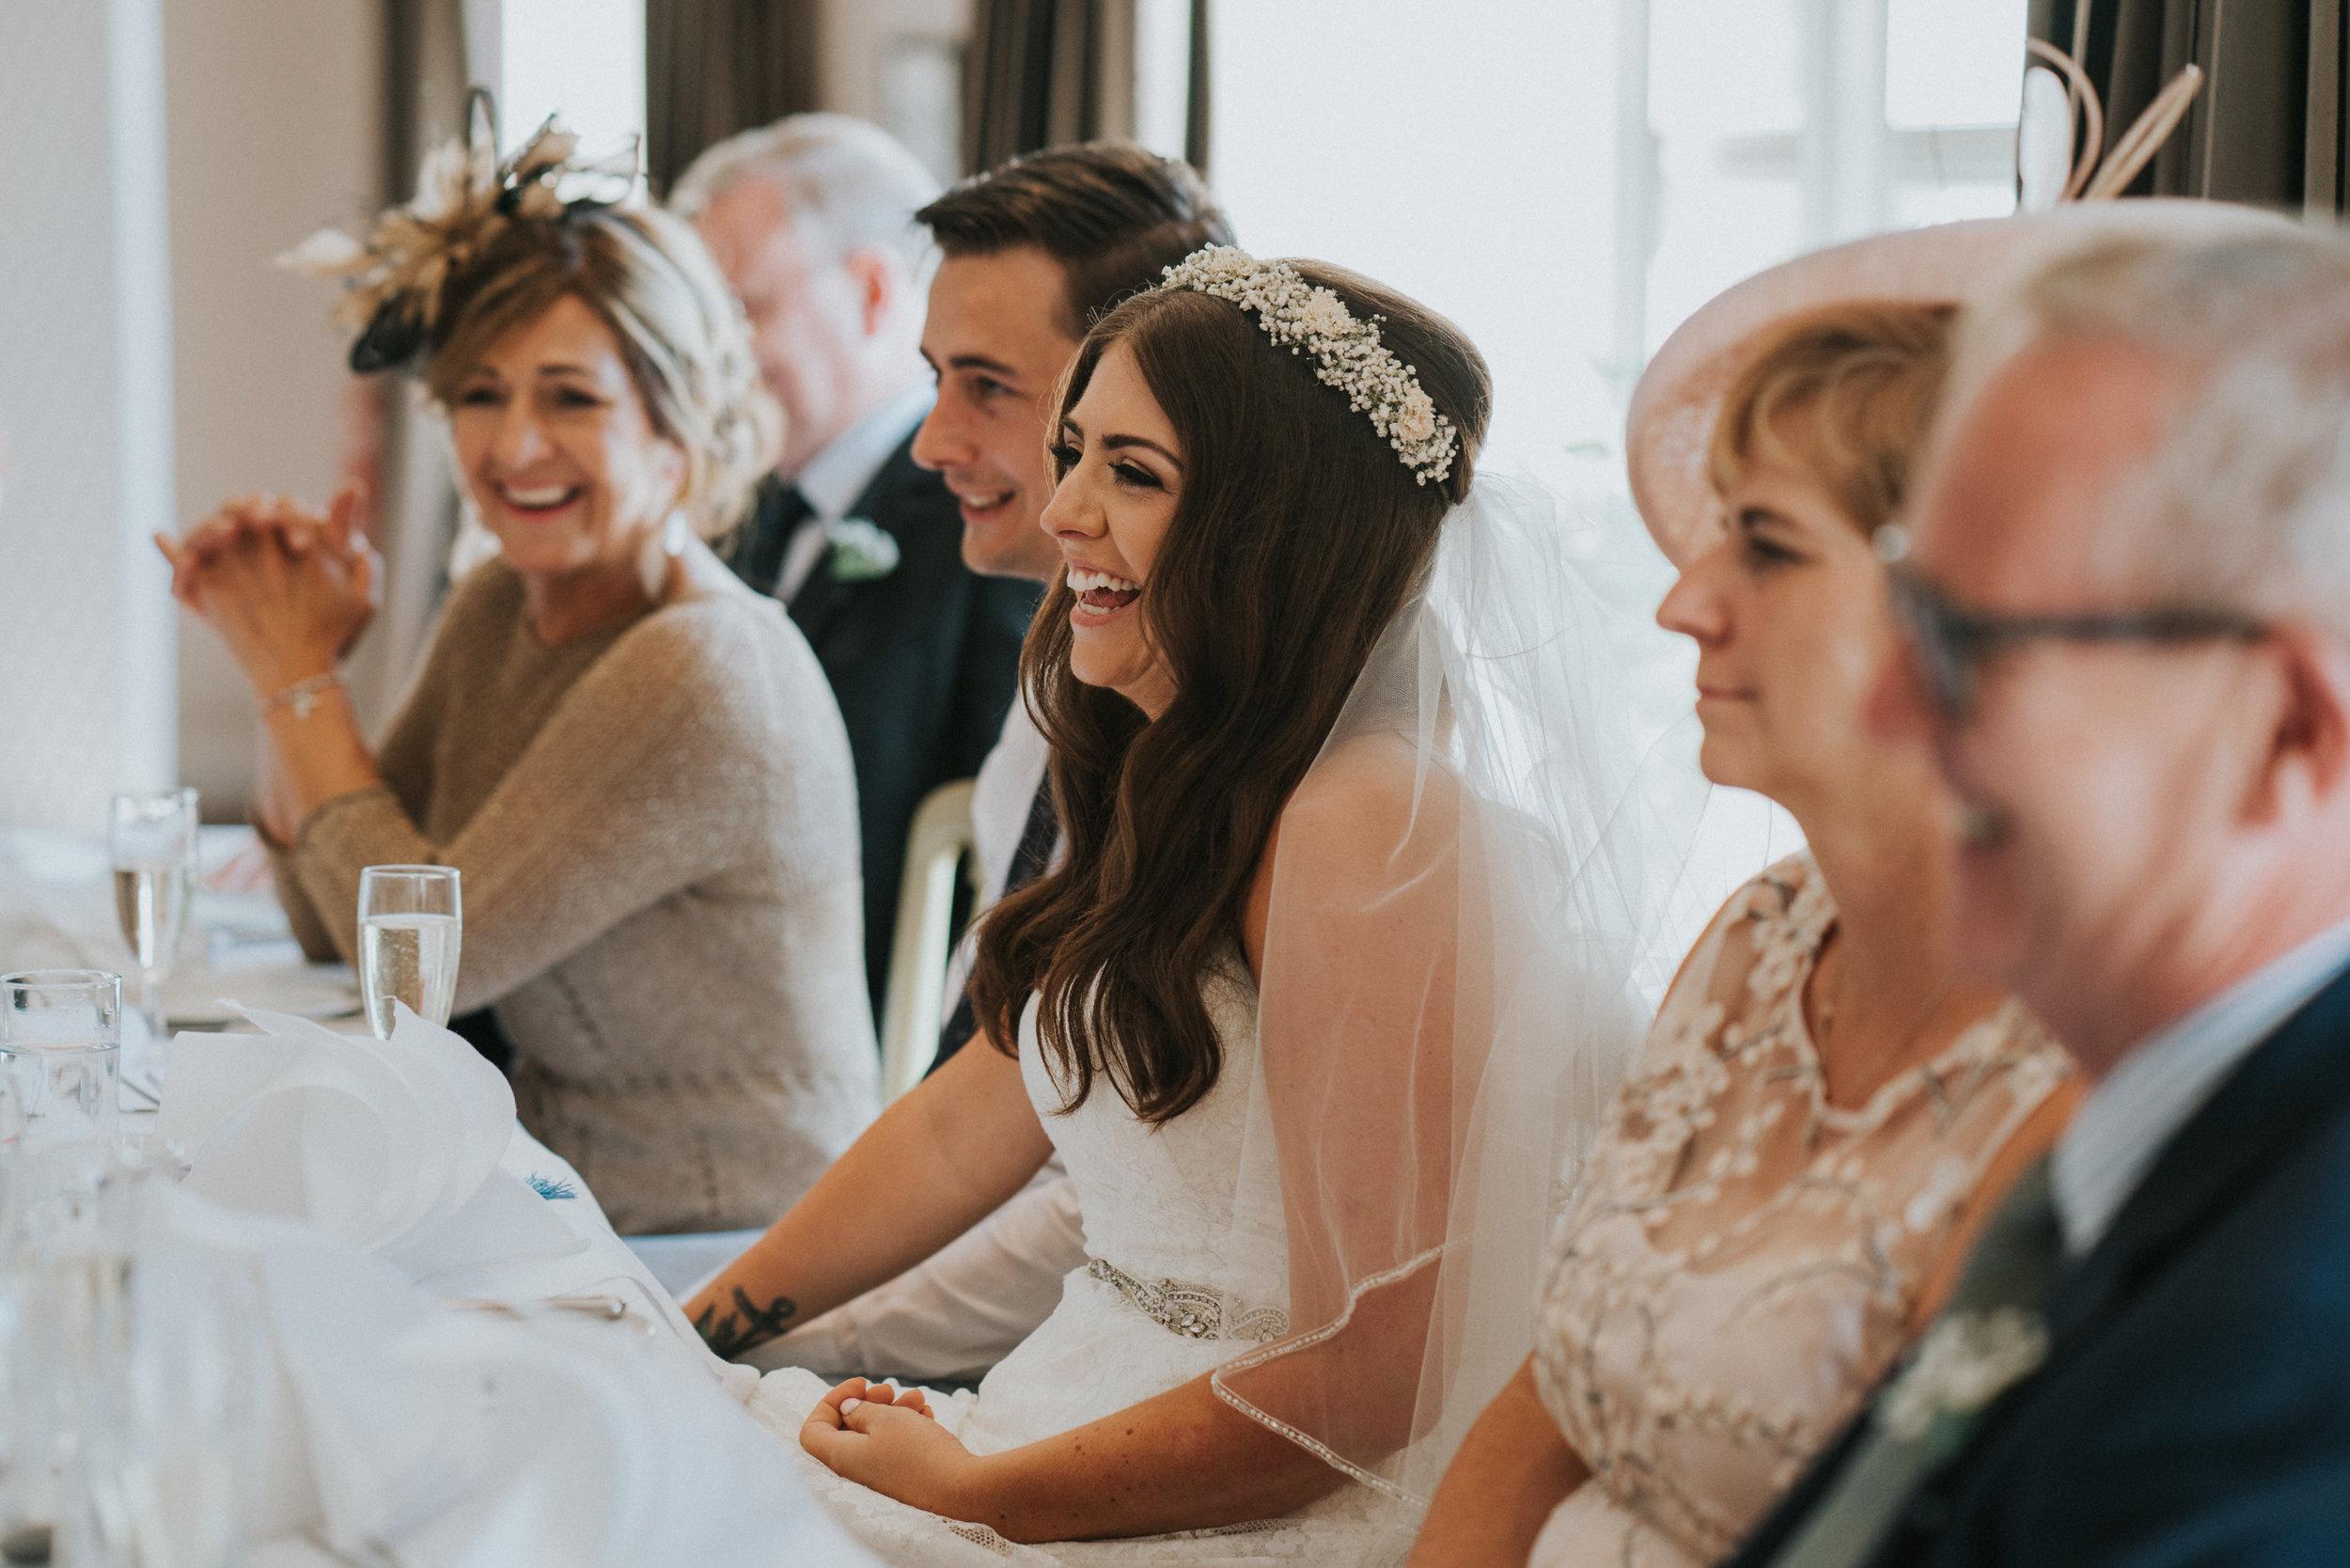 Sophie-Christian-Prested-Hall-Grace-Elizabeth-Previews-Essex-Norfolk-Suffolk-Devon-Alternative-Wedding-Photographer (20 of 20).jpg